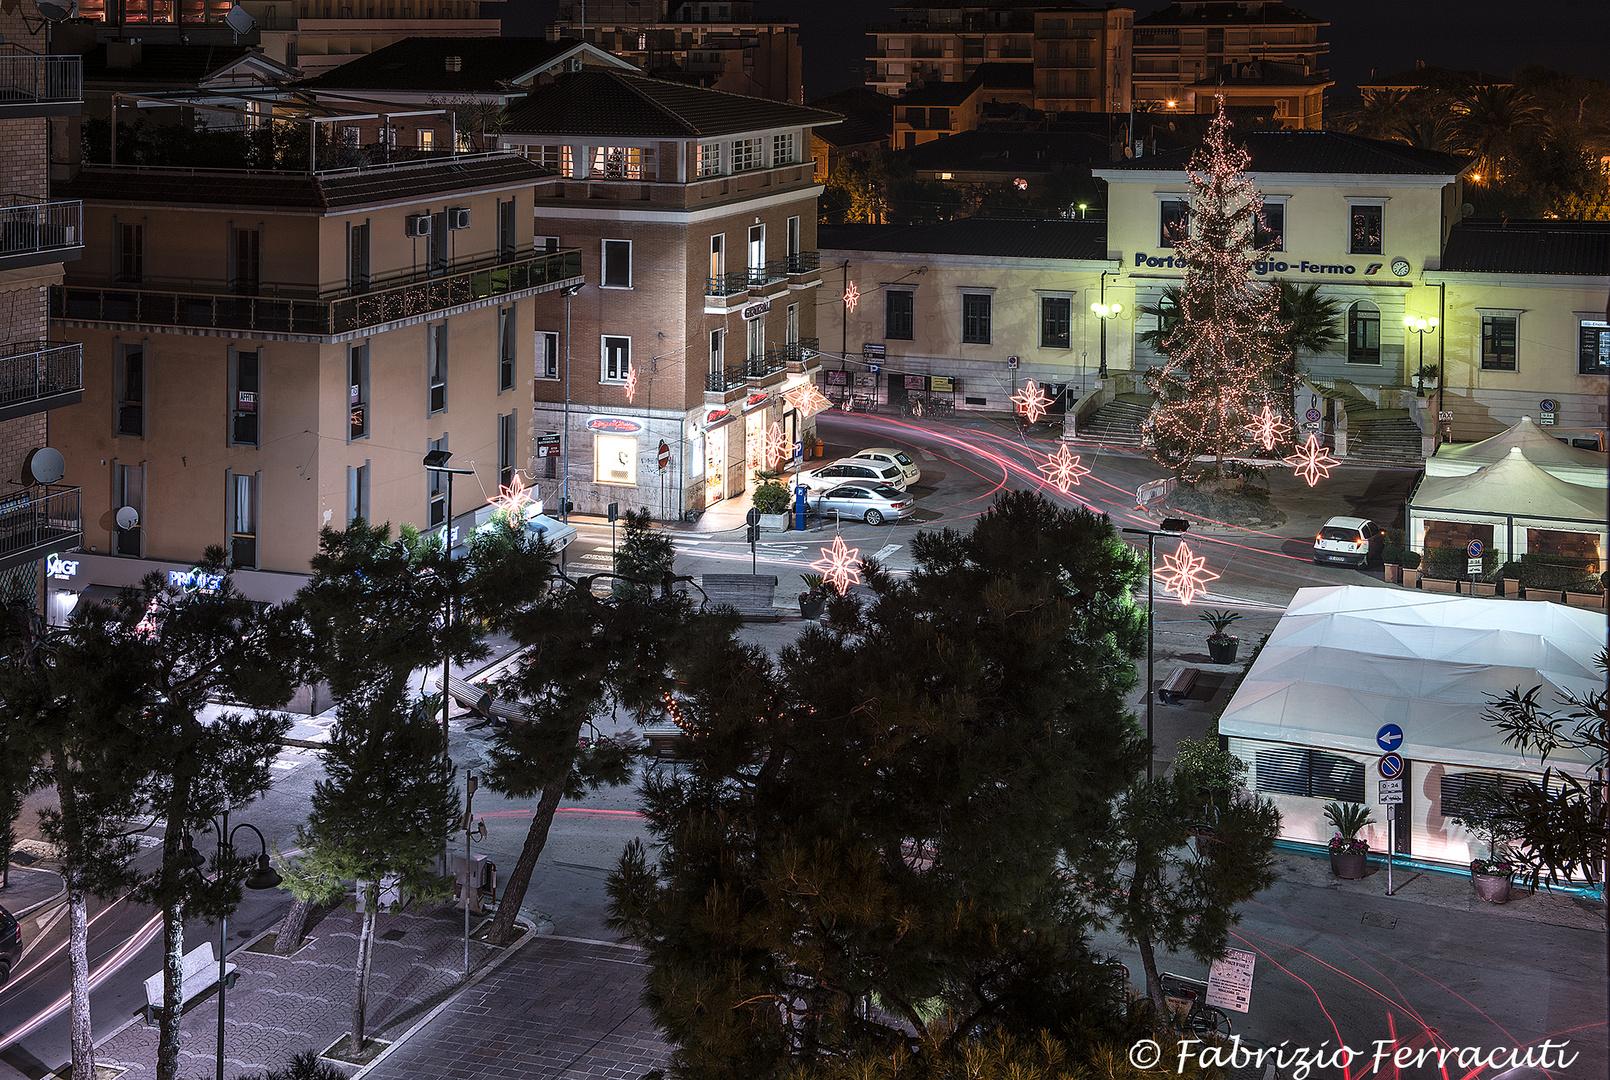 Addobbi natalizi a Porto San Giorgio